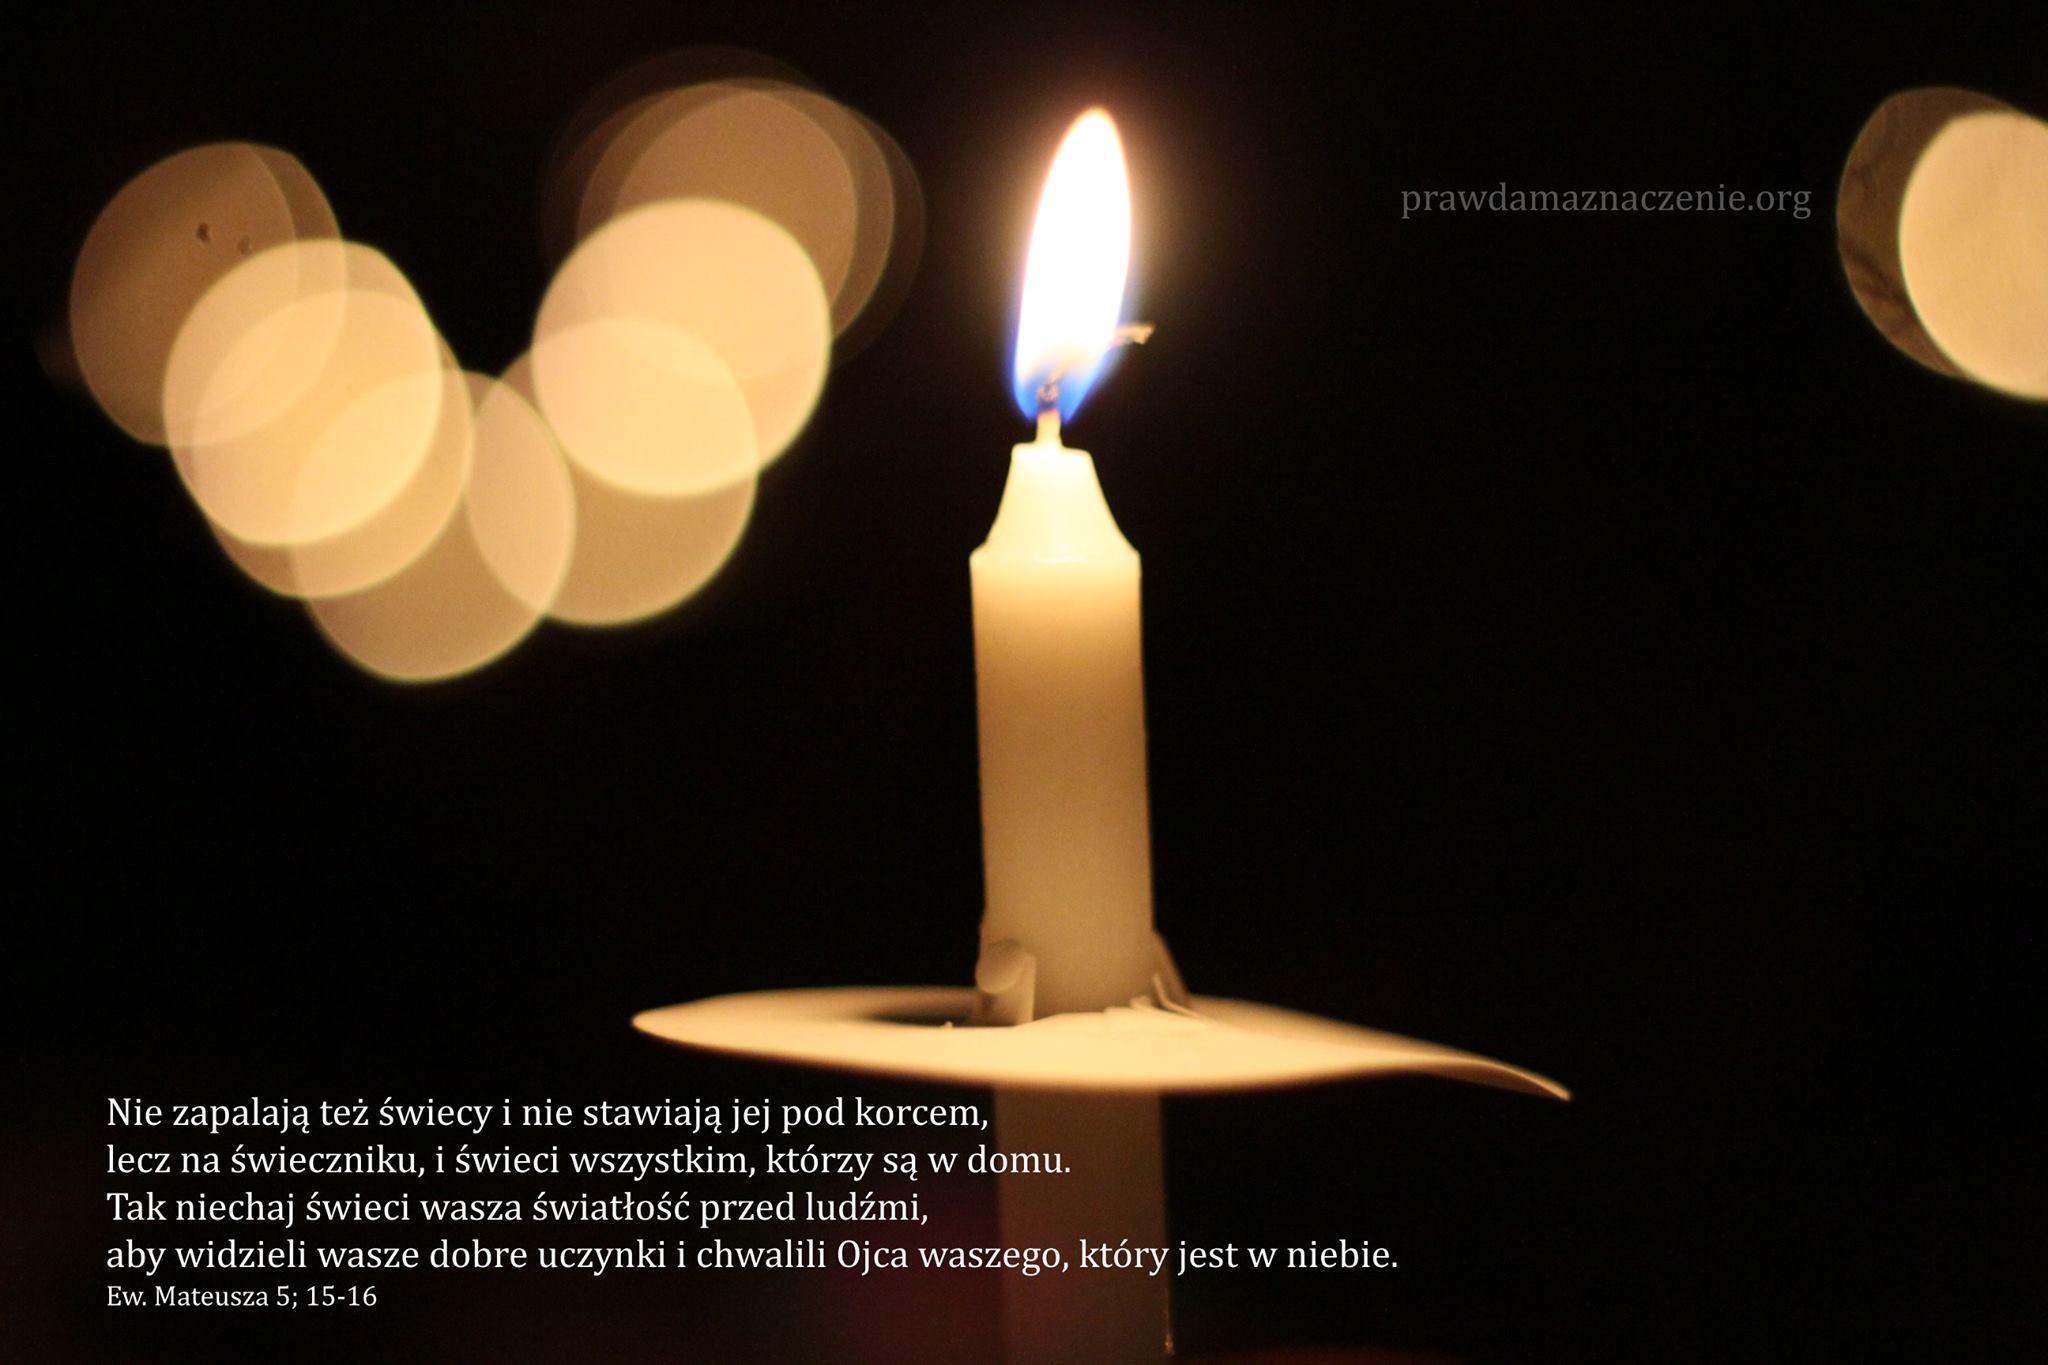 EW Mateusza 5:15-16